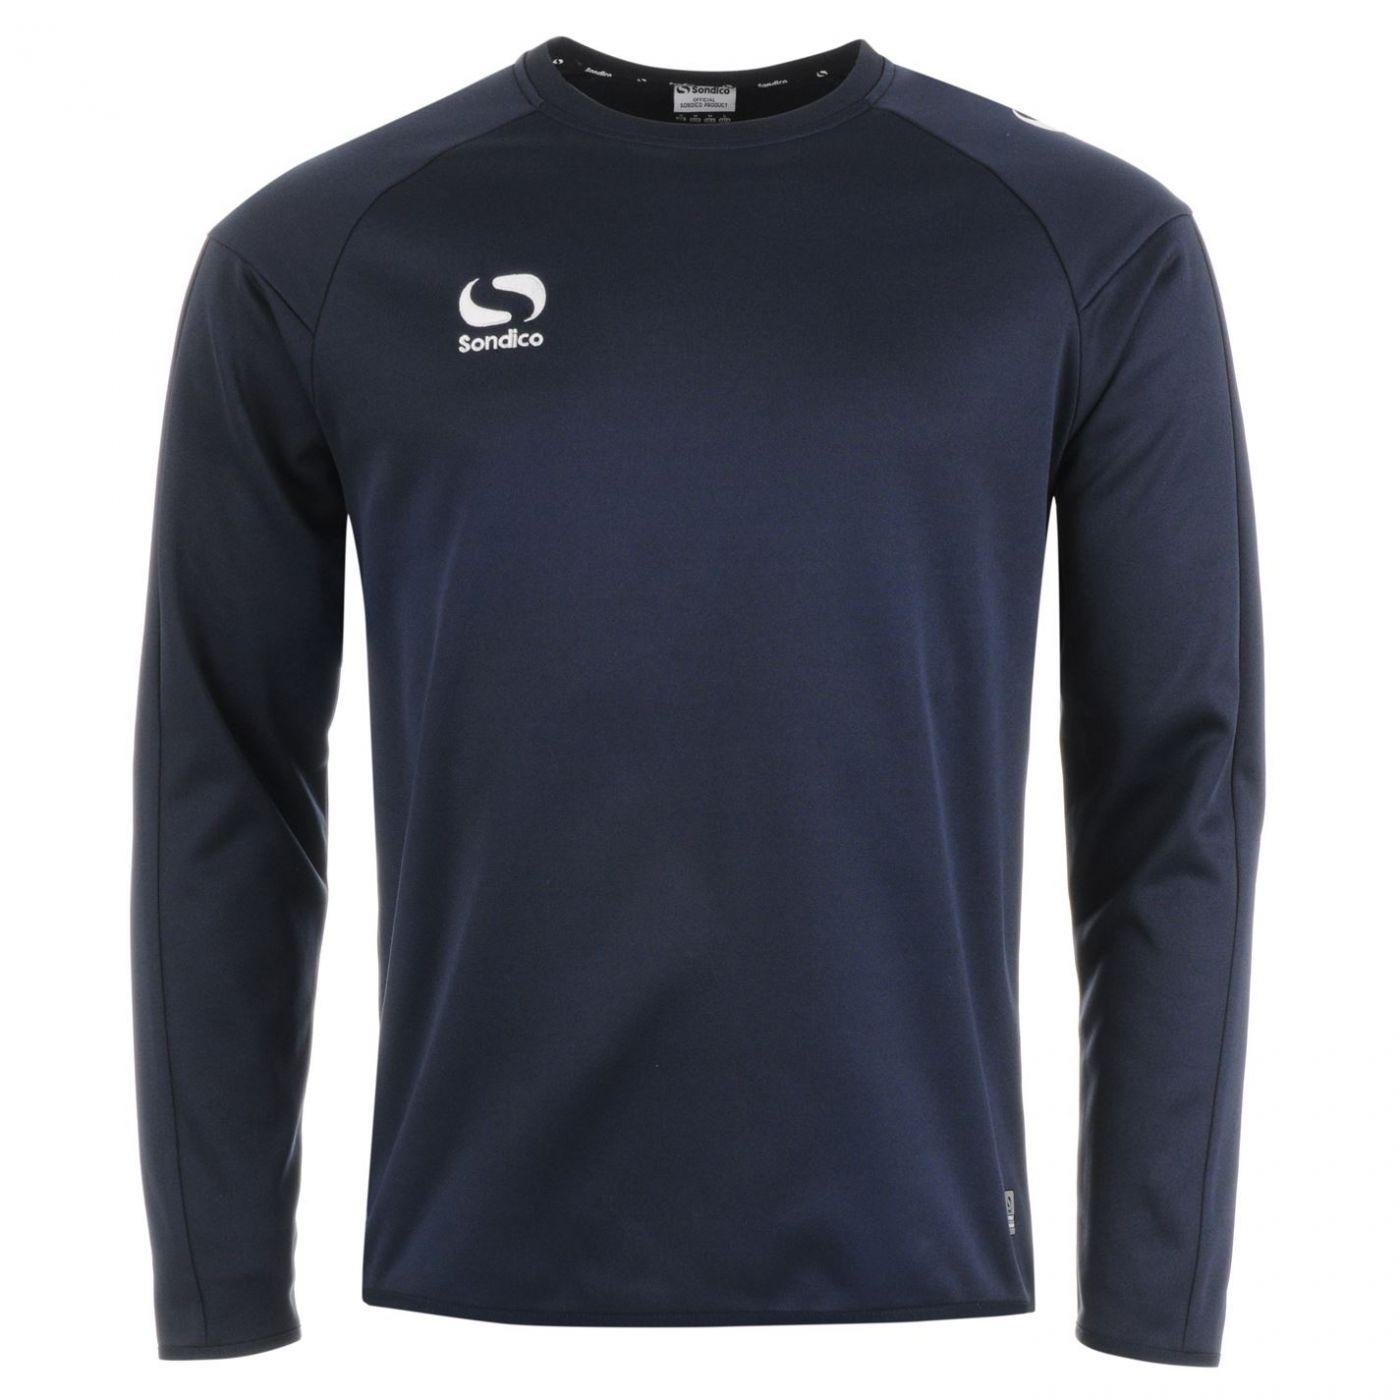 Men's sweatshirt Sondico Strike Crew